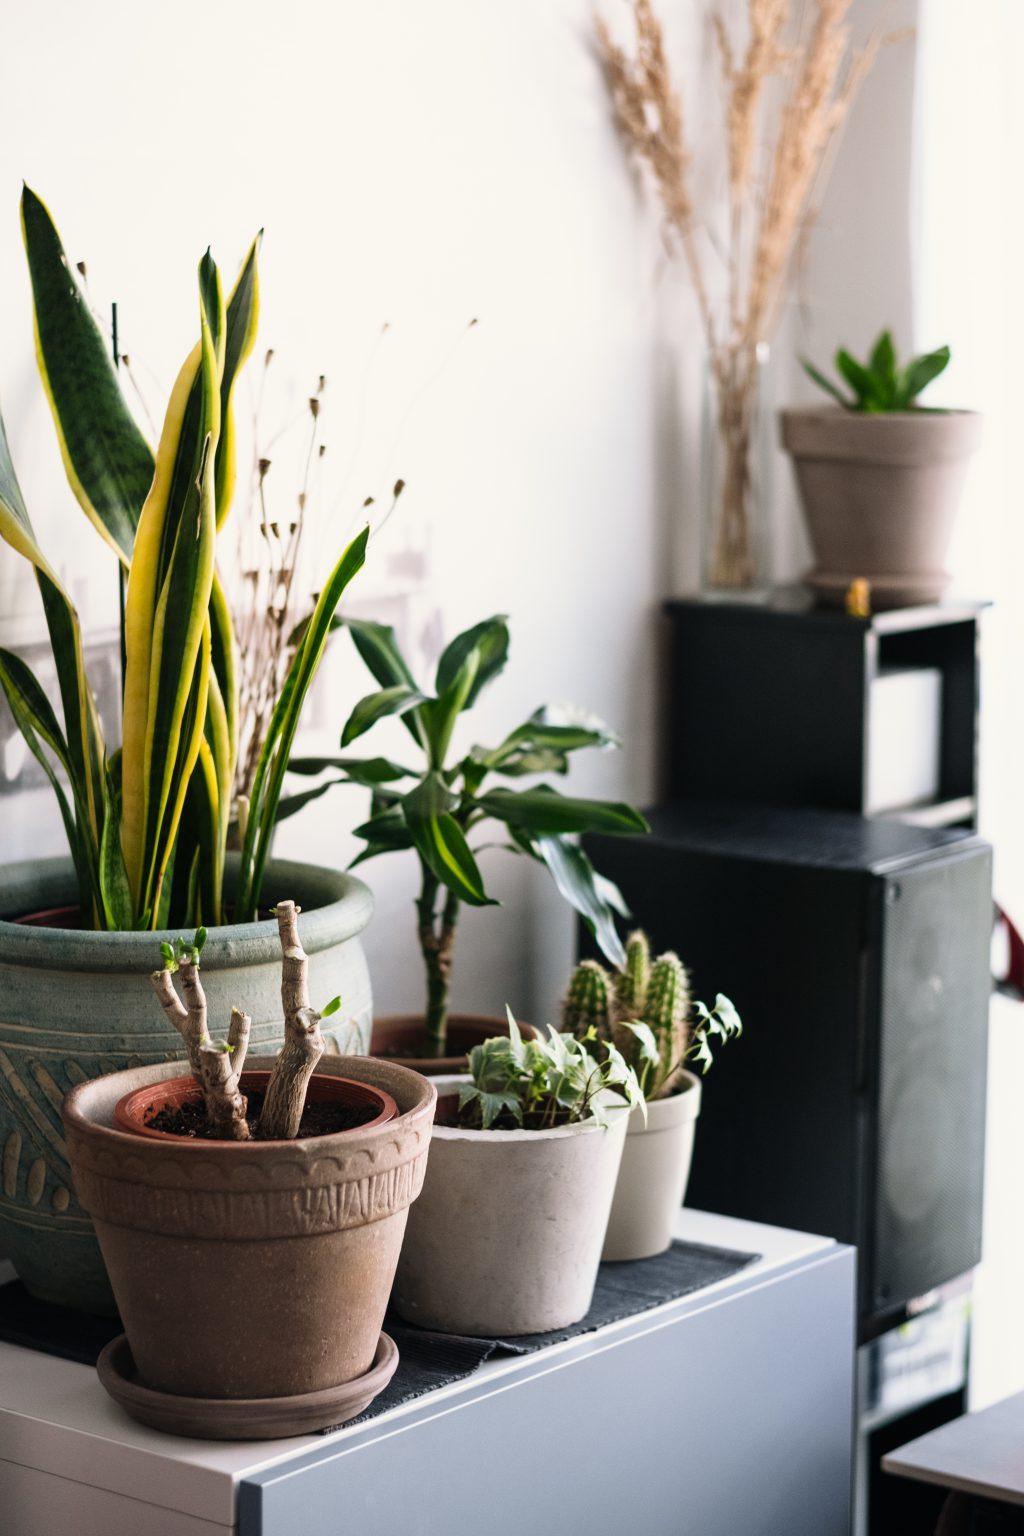 House plants 3 - free stock photo